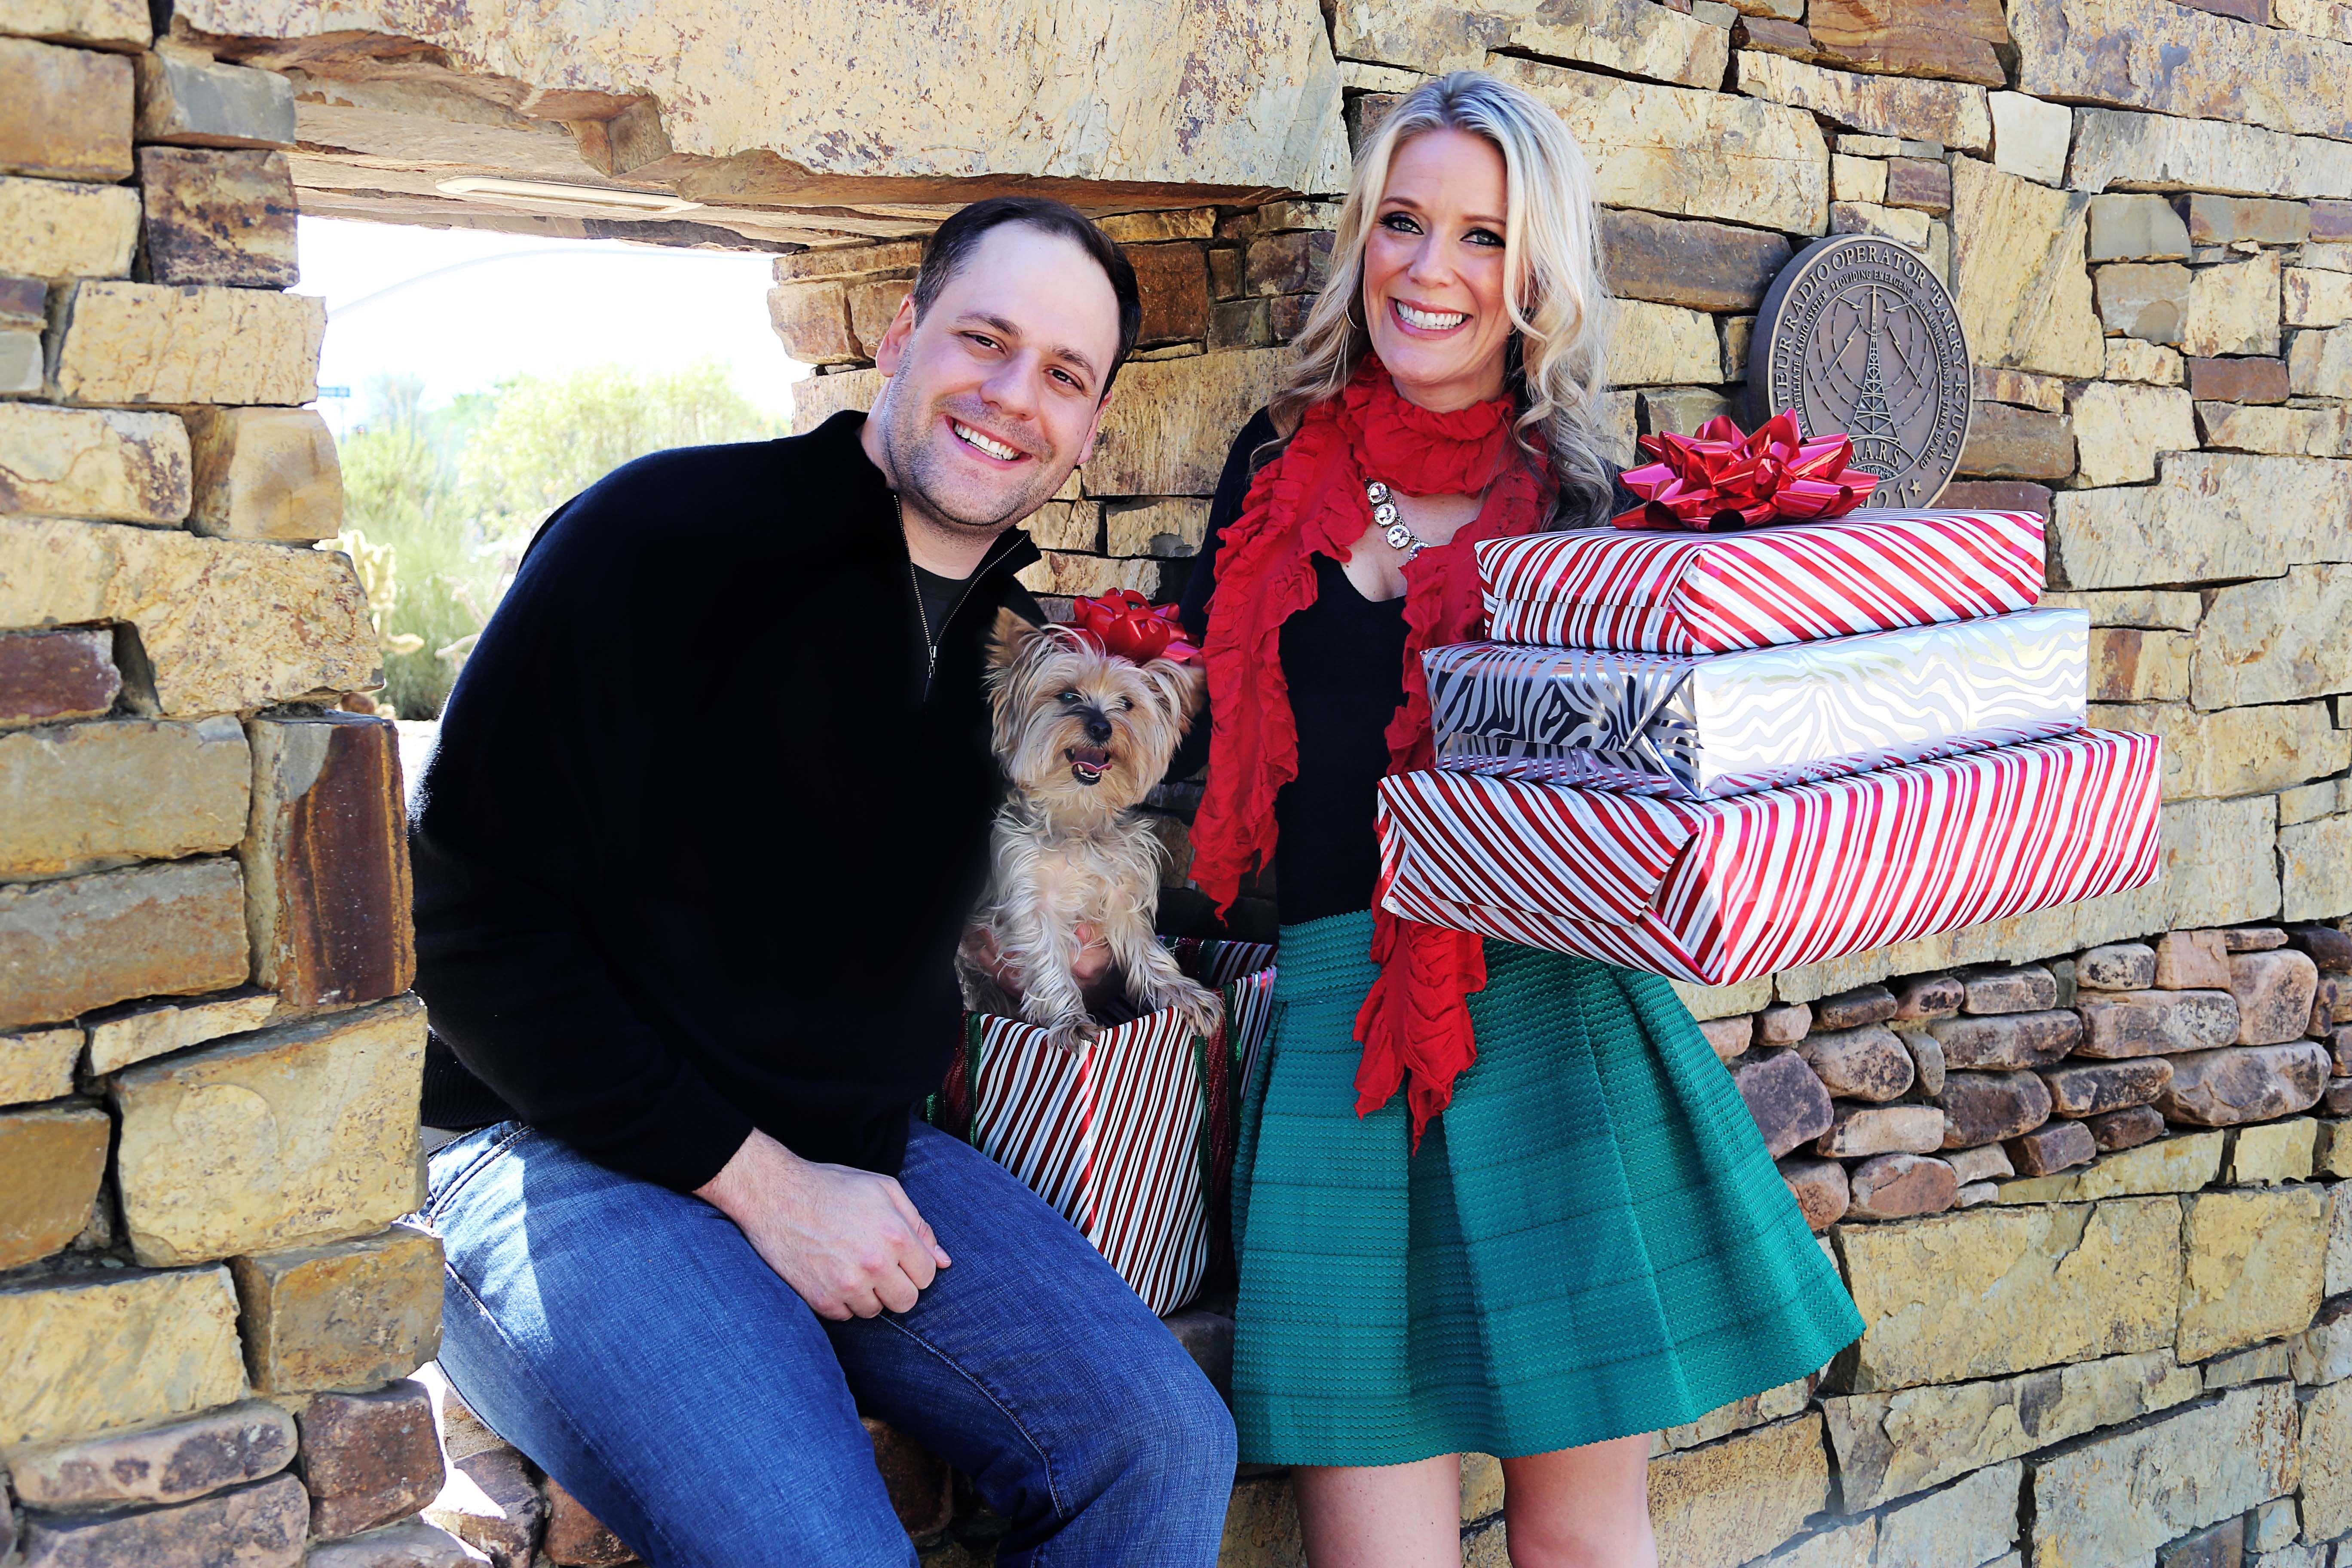 Merry Christmas! <3  #ChristmasCardPhotos #ChristmasCard #Christmas #Family #FamilyPhoto #Yorkie #Dog #FunPhotos #Festive  Styled by @Malgorzata Kolosowska Events by Alison Johnson